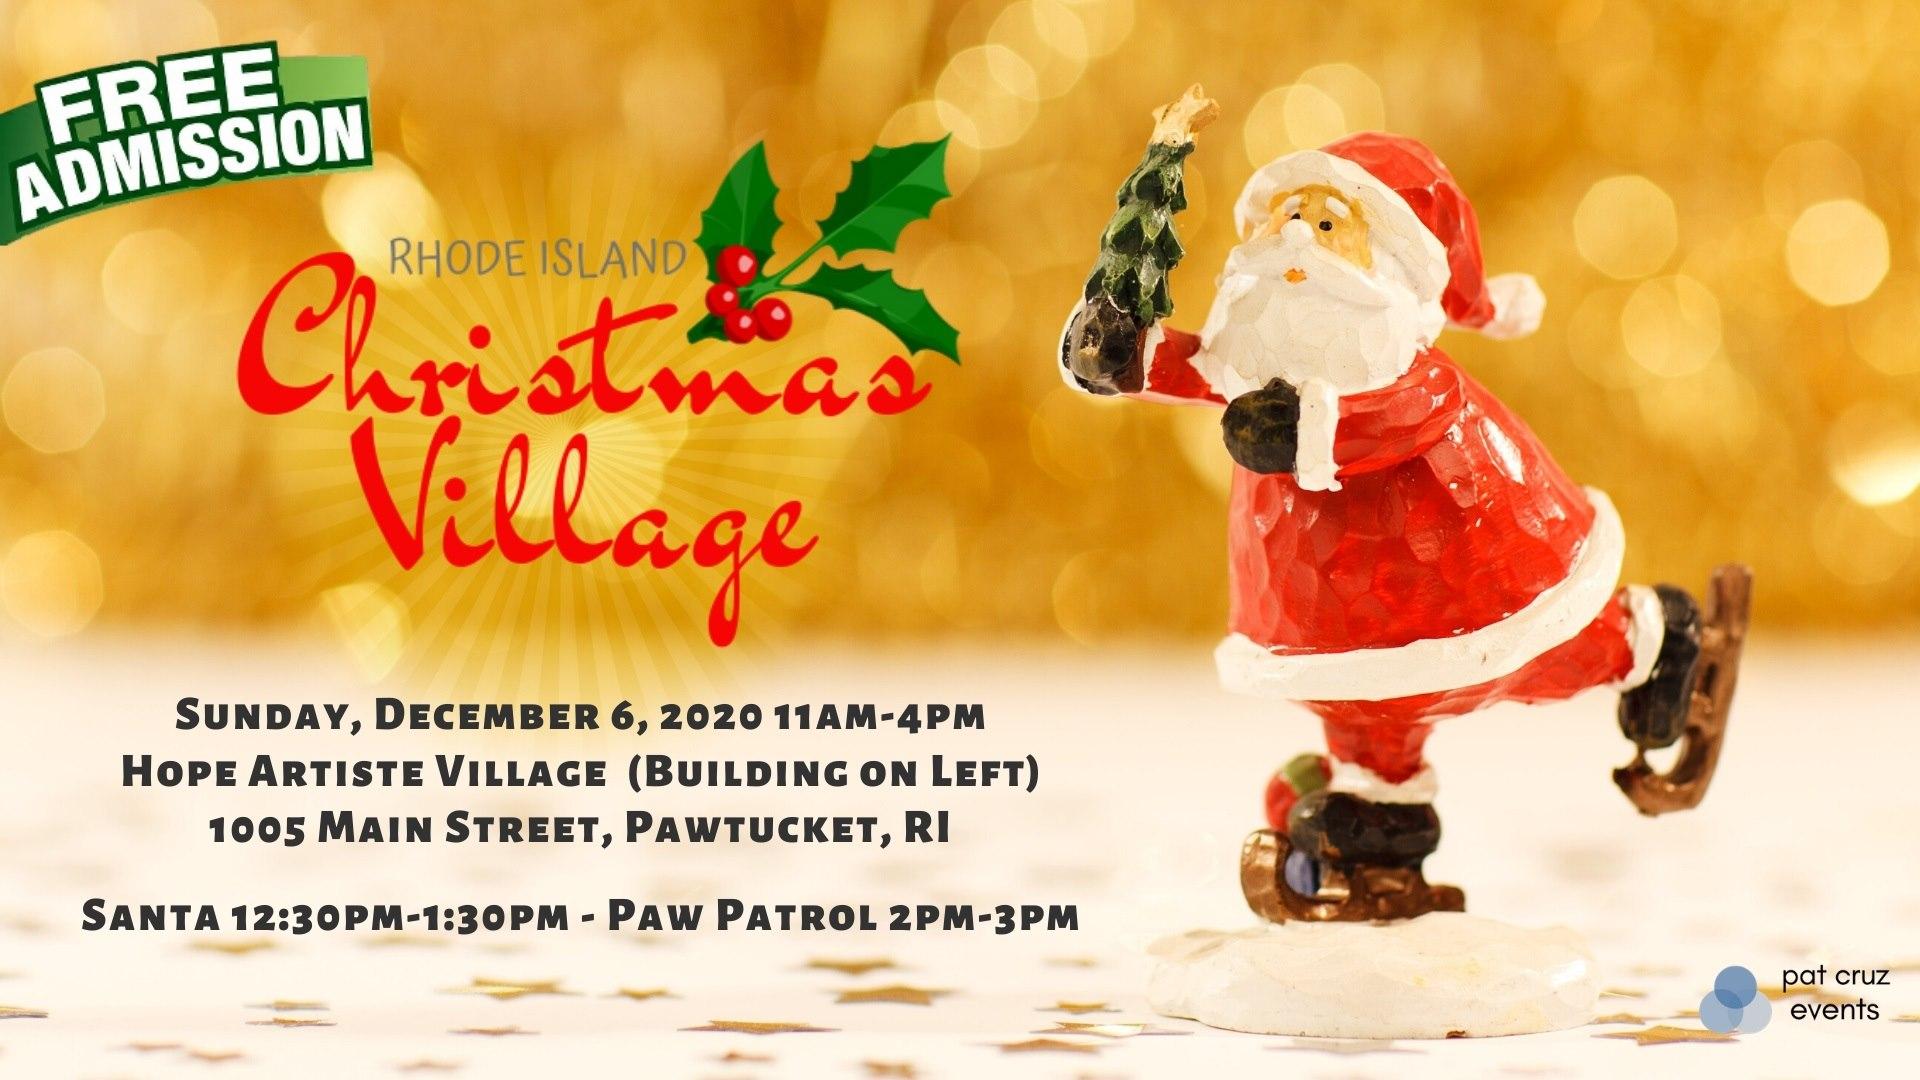 Rhode Island Christmas Village | Things To Do In Rhode Island | RI